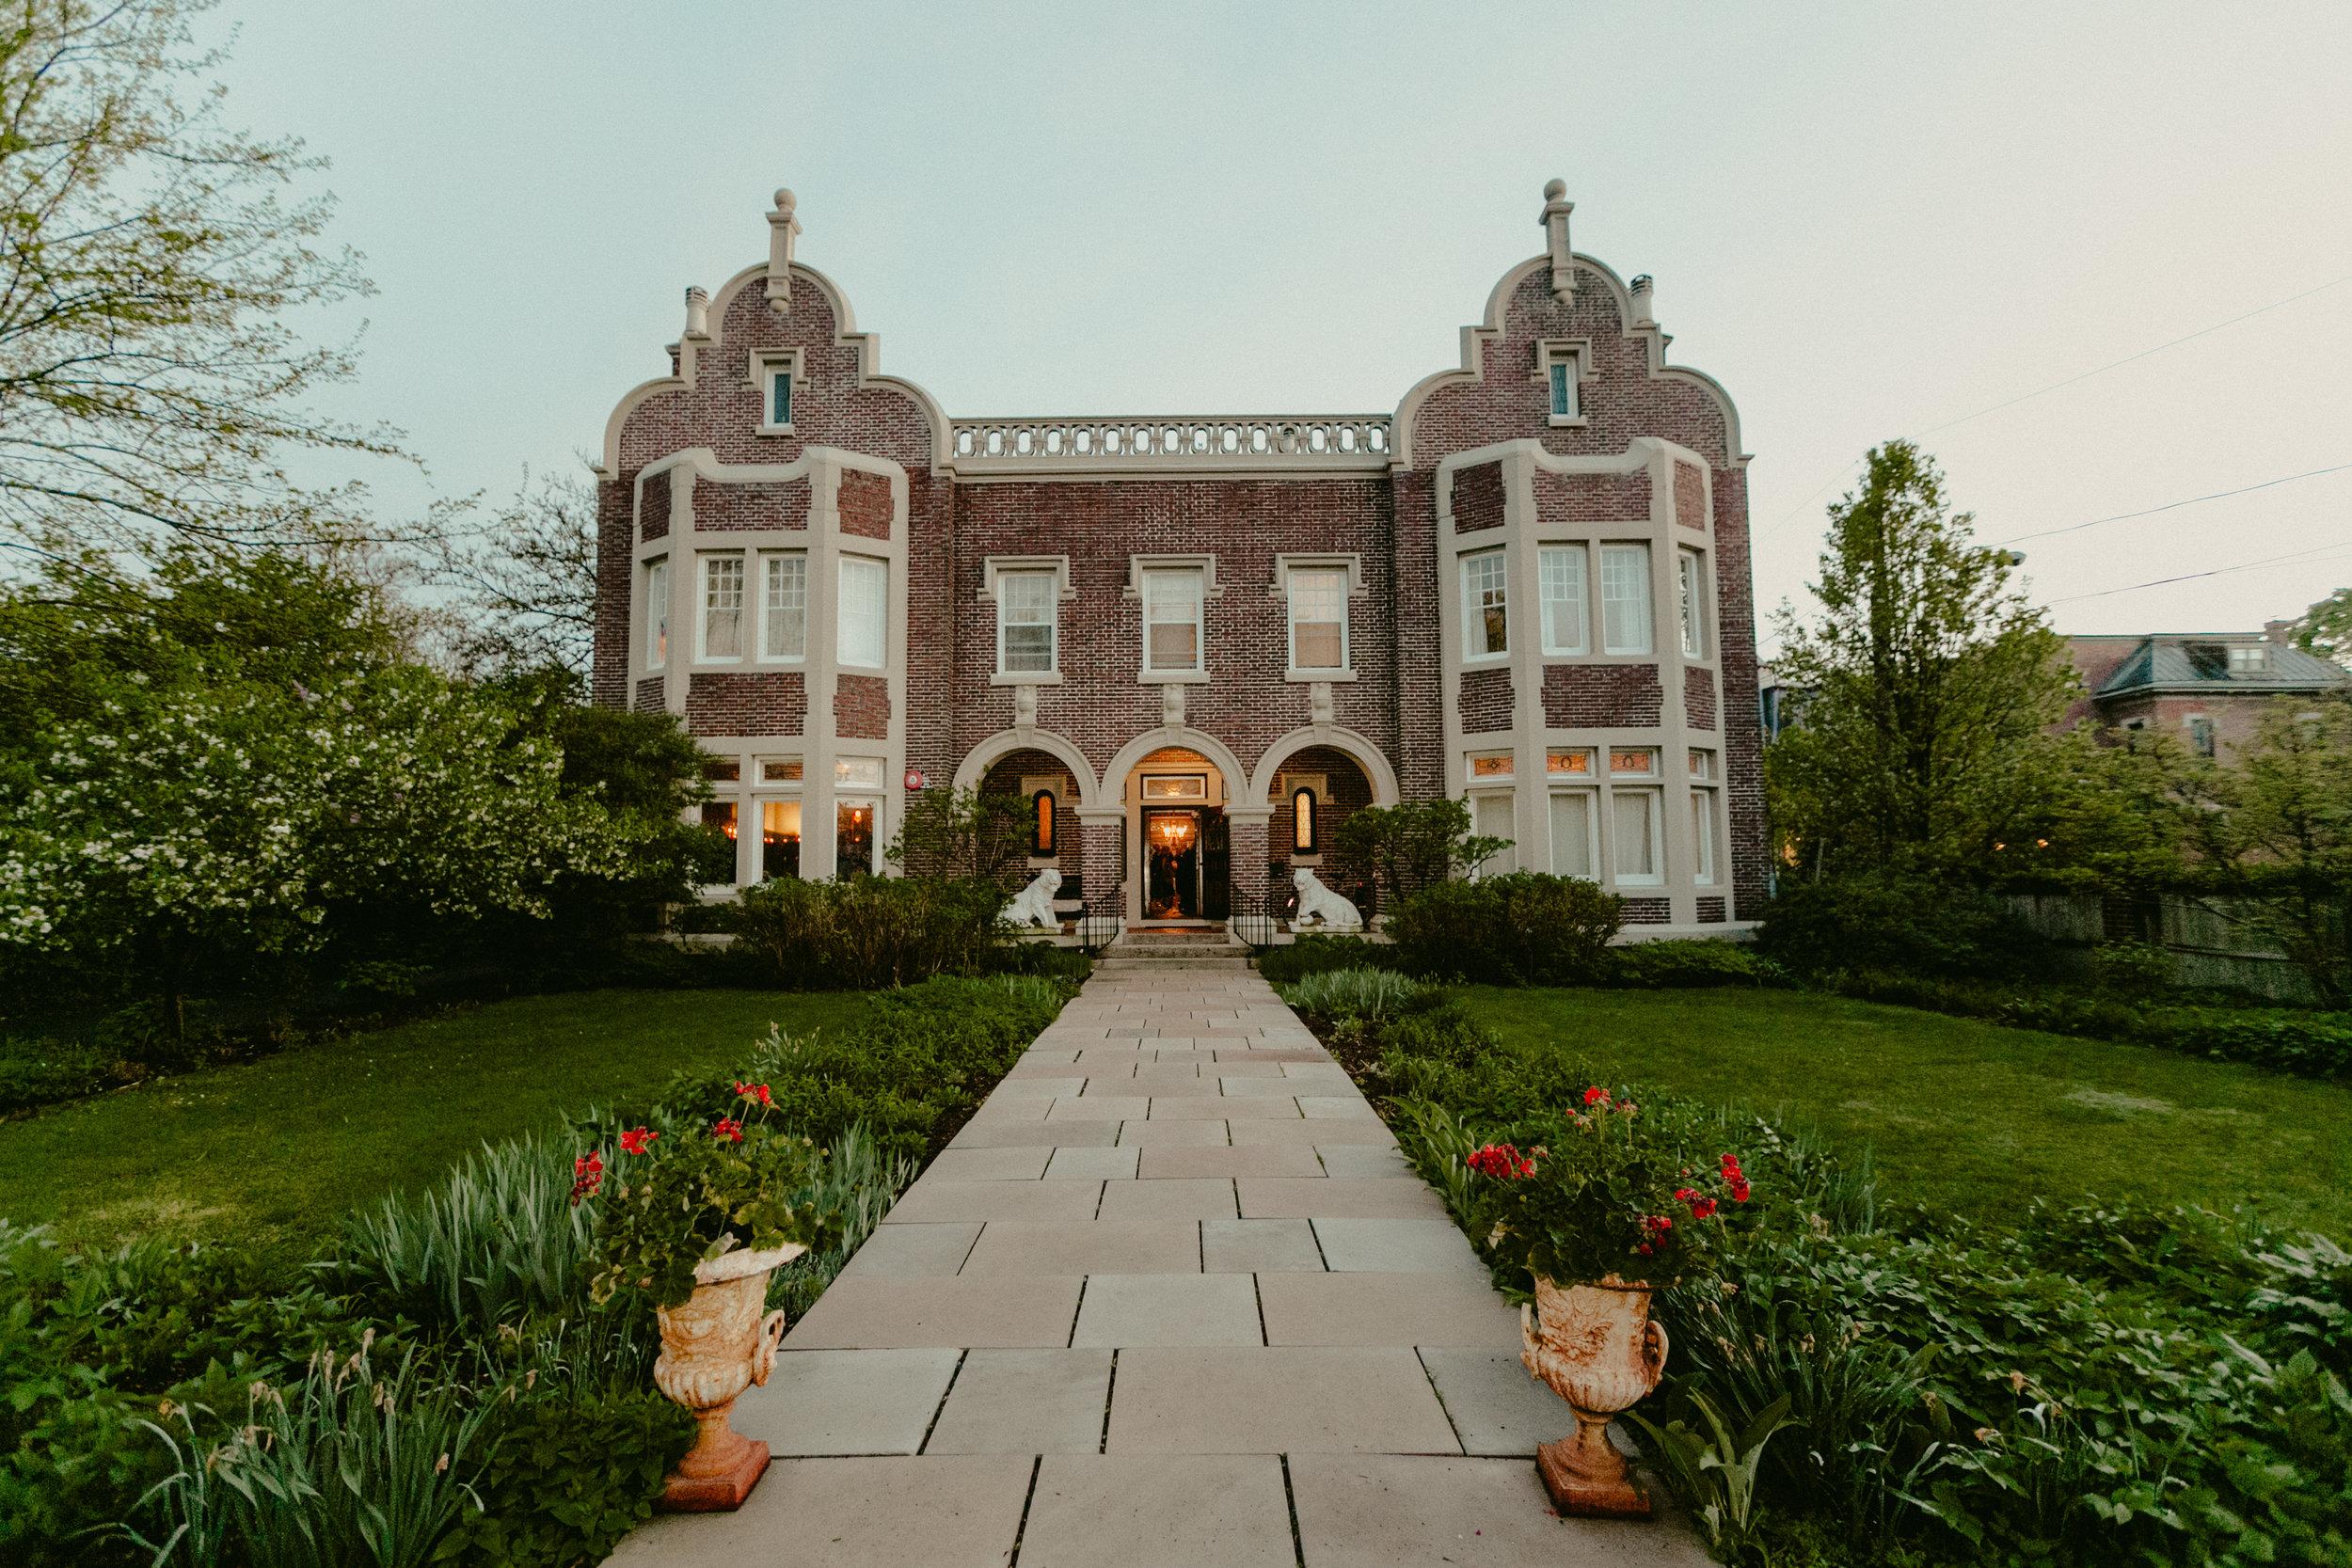 Tiger_House_The_Inn_at_Hudson-Wedding_Chellise_Michael_Photography-434.jpg